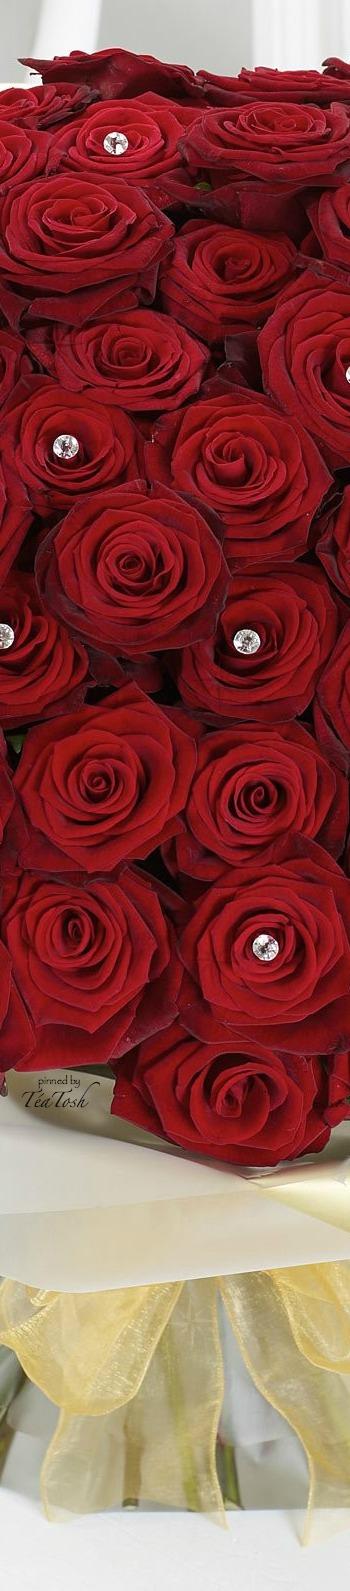 Téa Tosh Ultimate 100 Grand Prix Rose Beautiful red